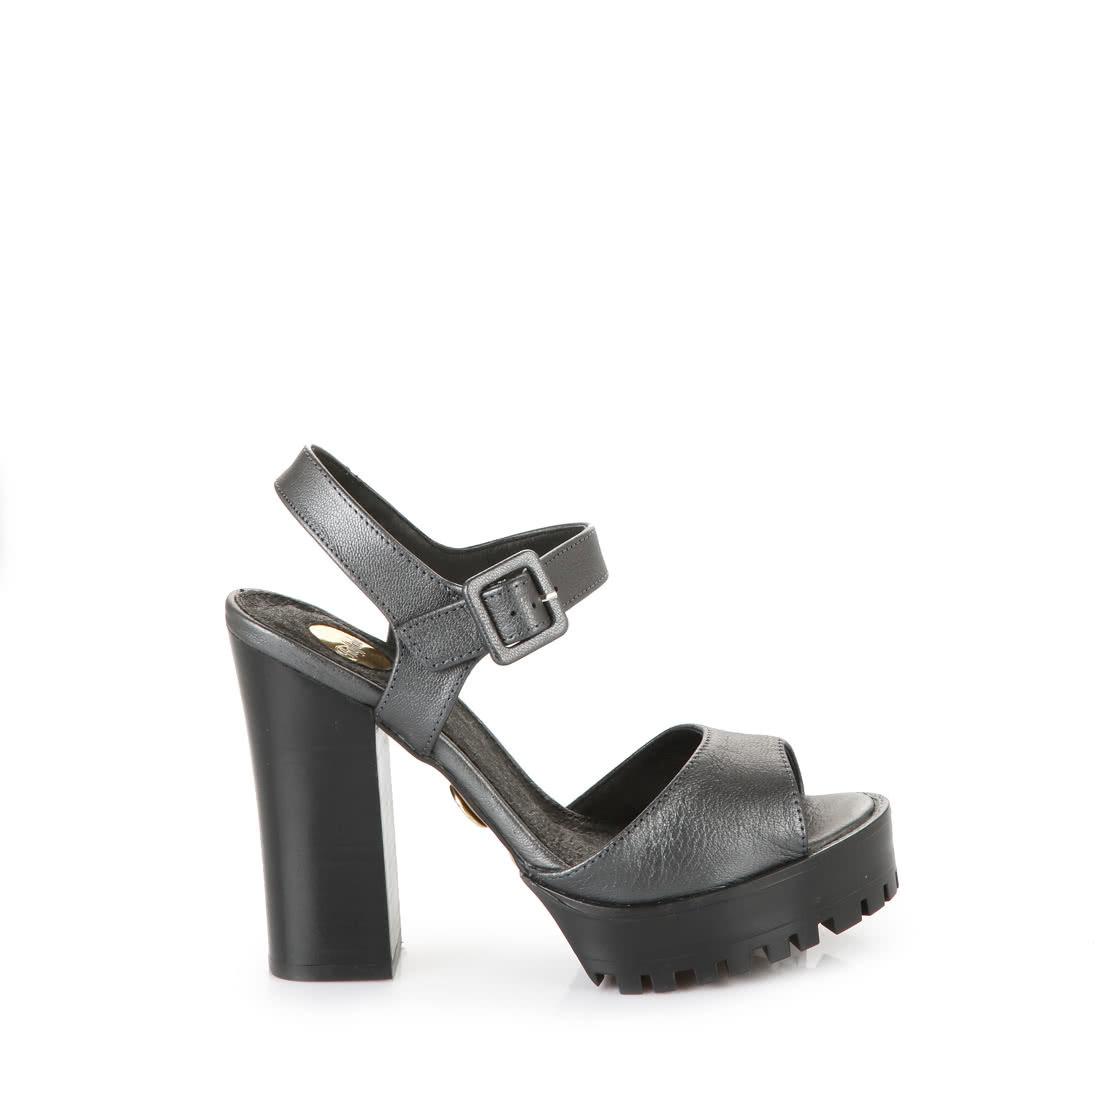 0ff728d8bf Buffalo anthracite metallic platform sandals buy online in BUFFALO ...